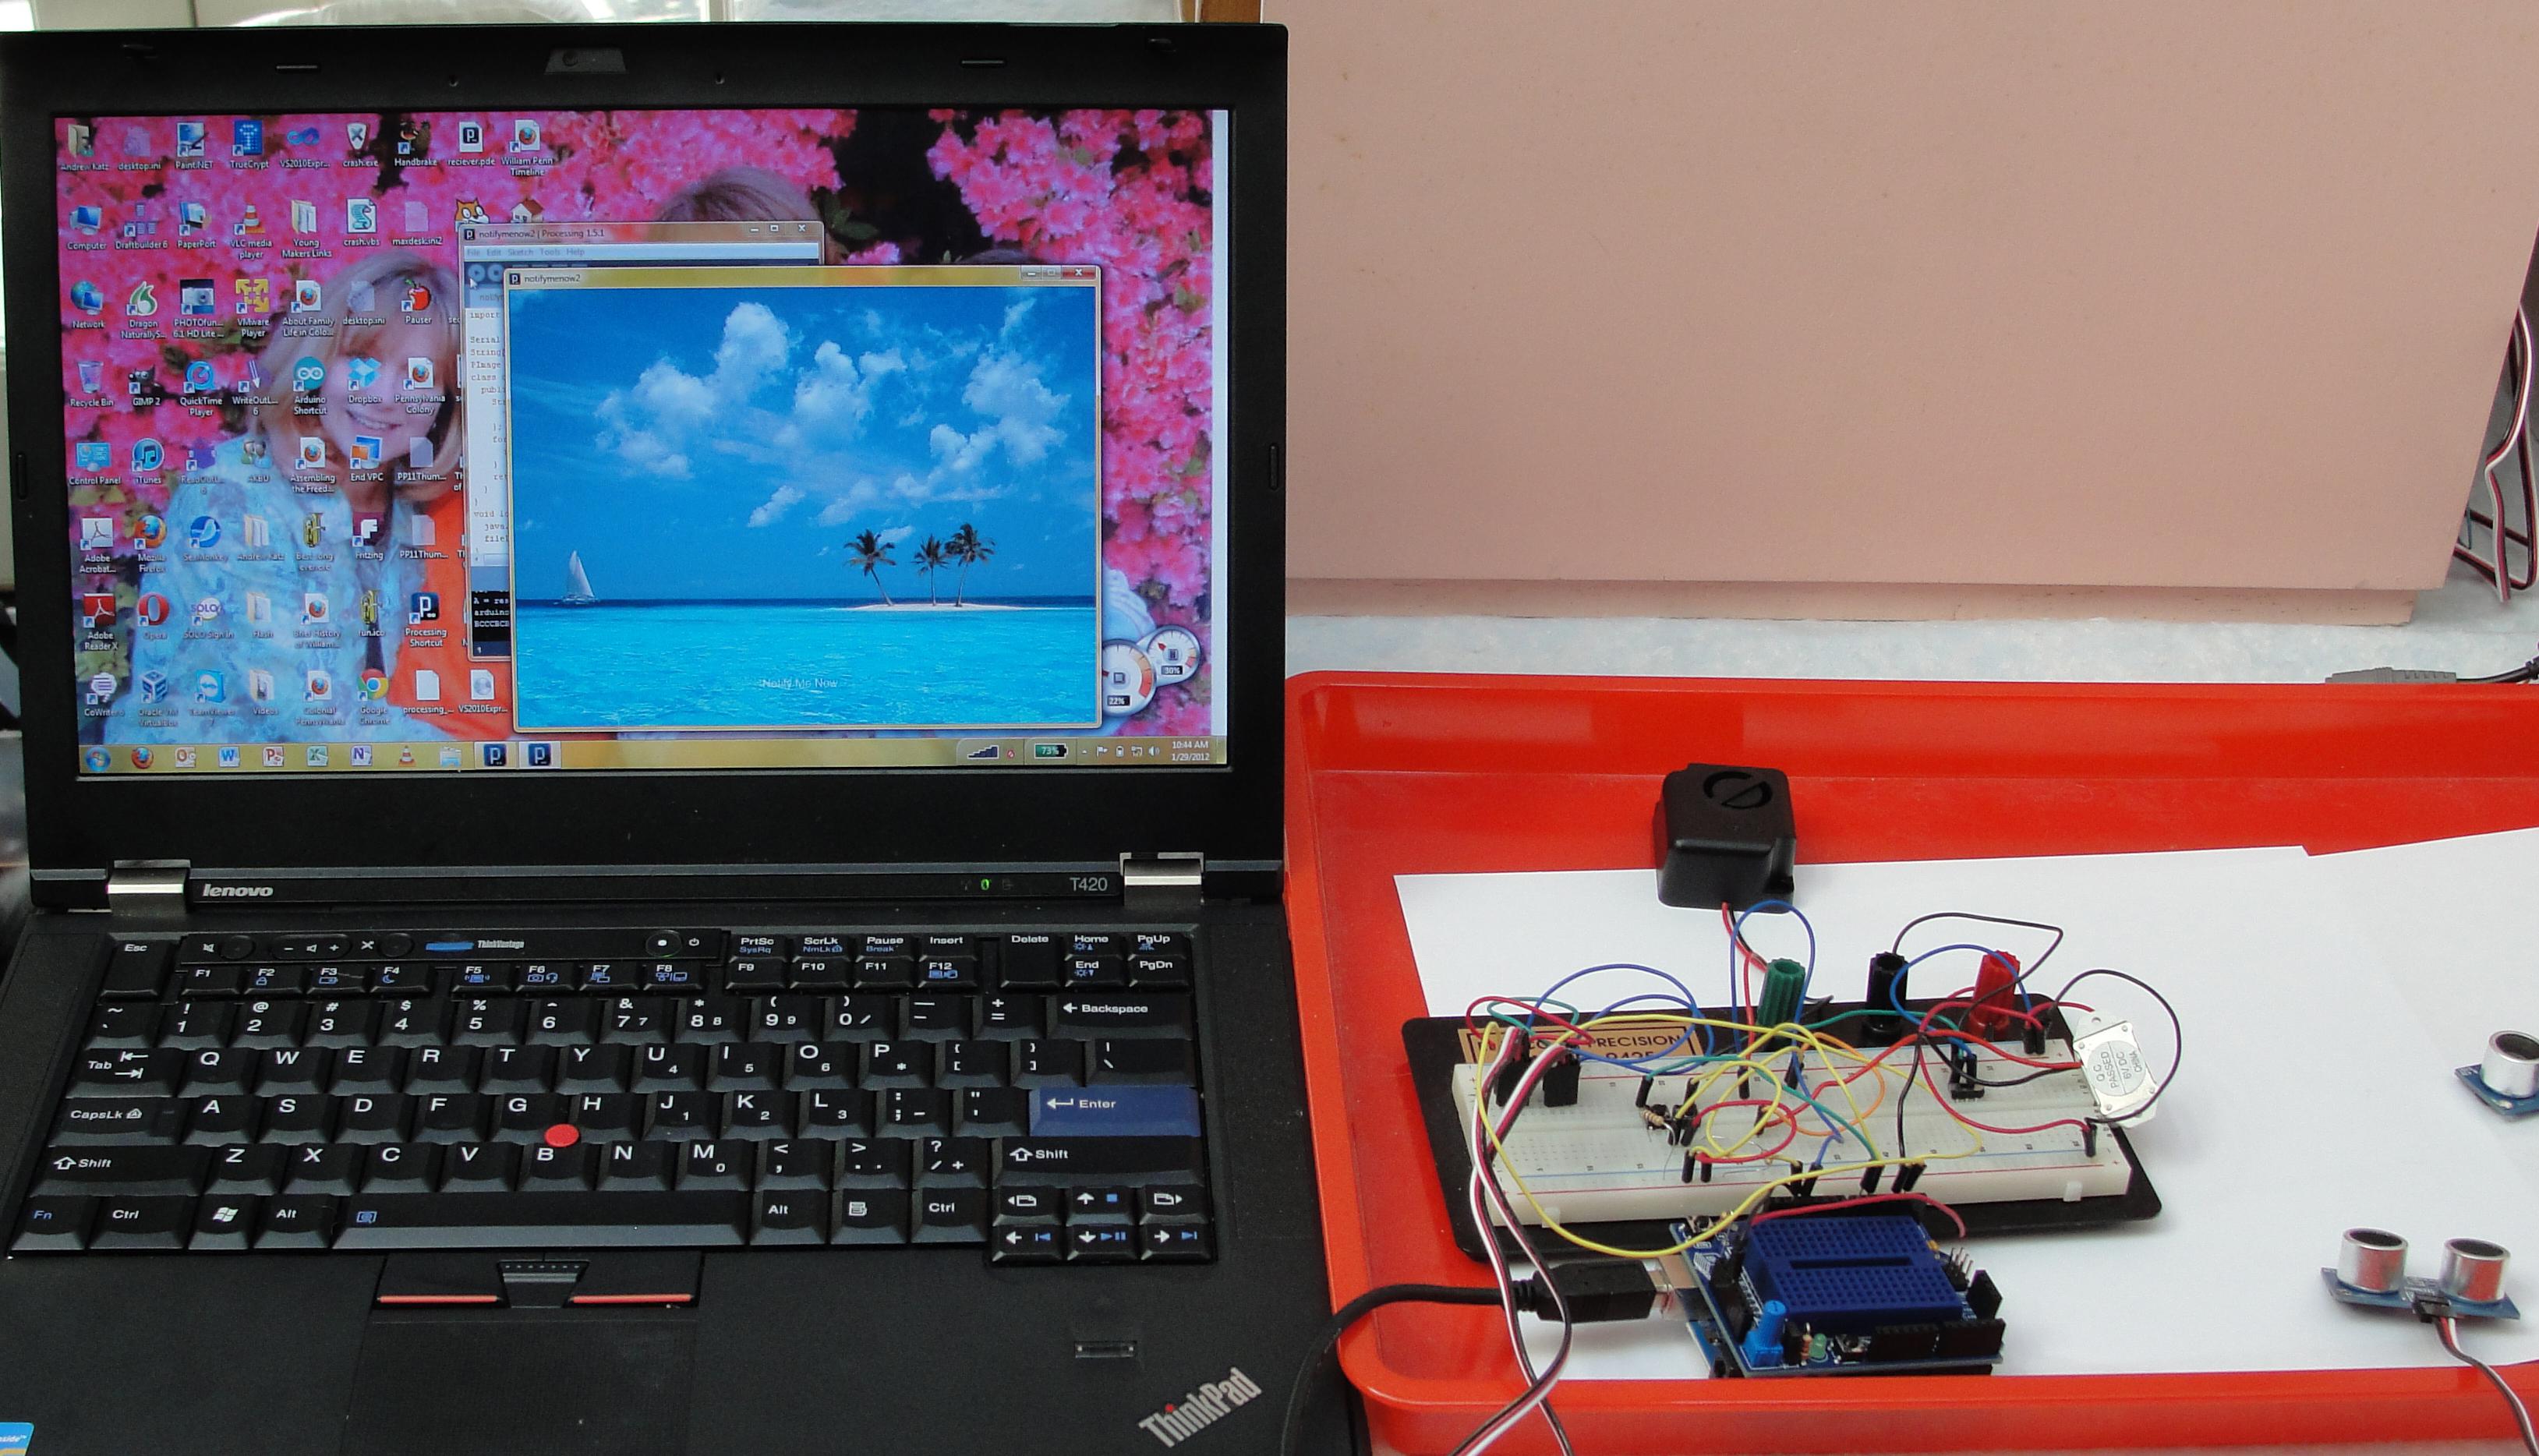 Prototyping & programming sensors